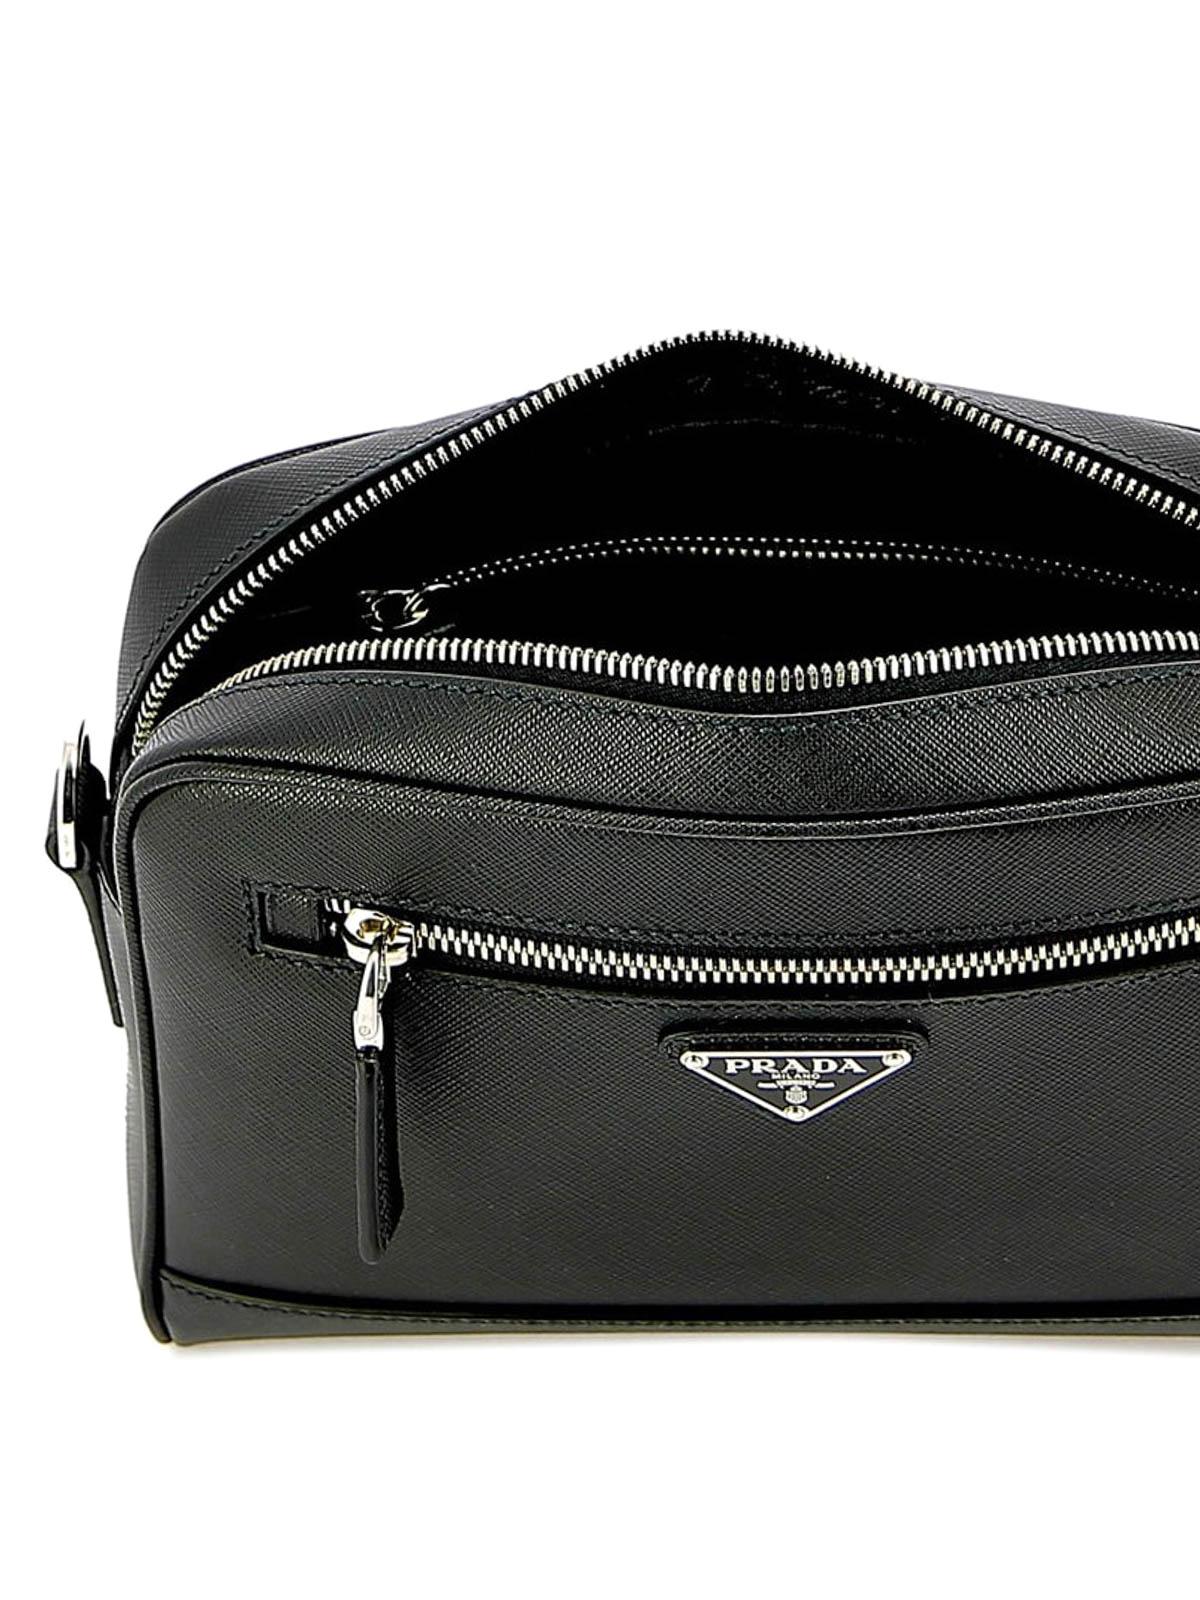 c69a014000f7db Prada - Black saffiano leather cross body bag - cross body bags ...